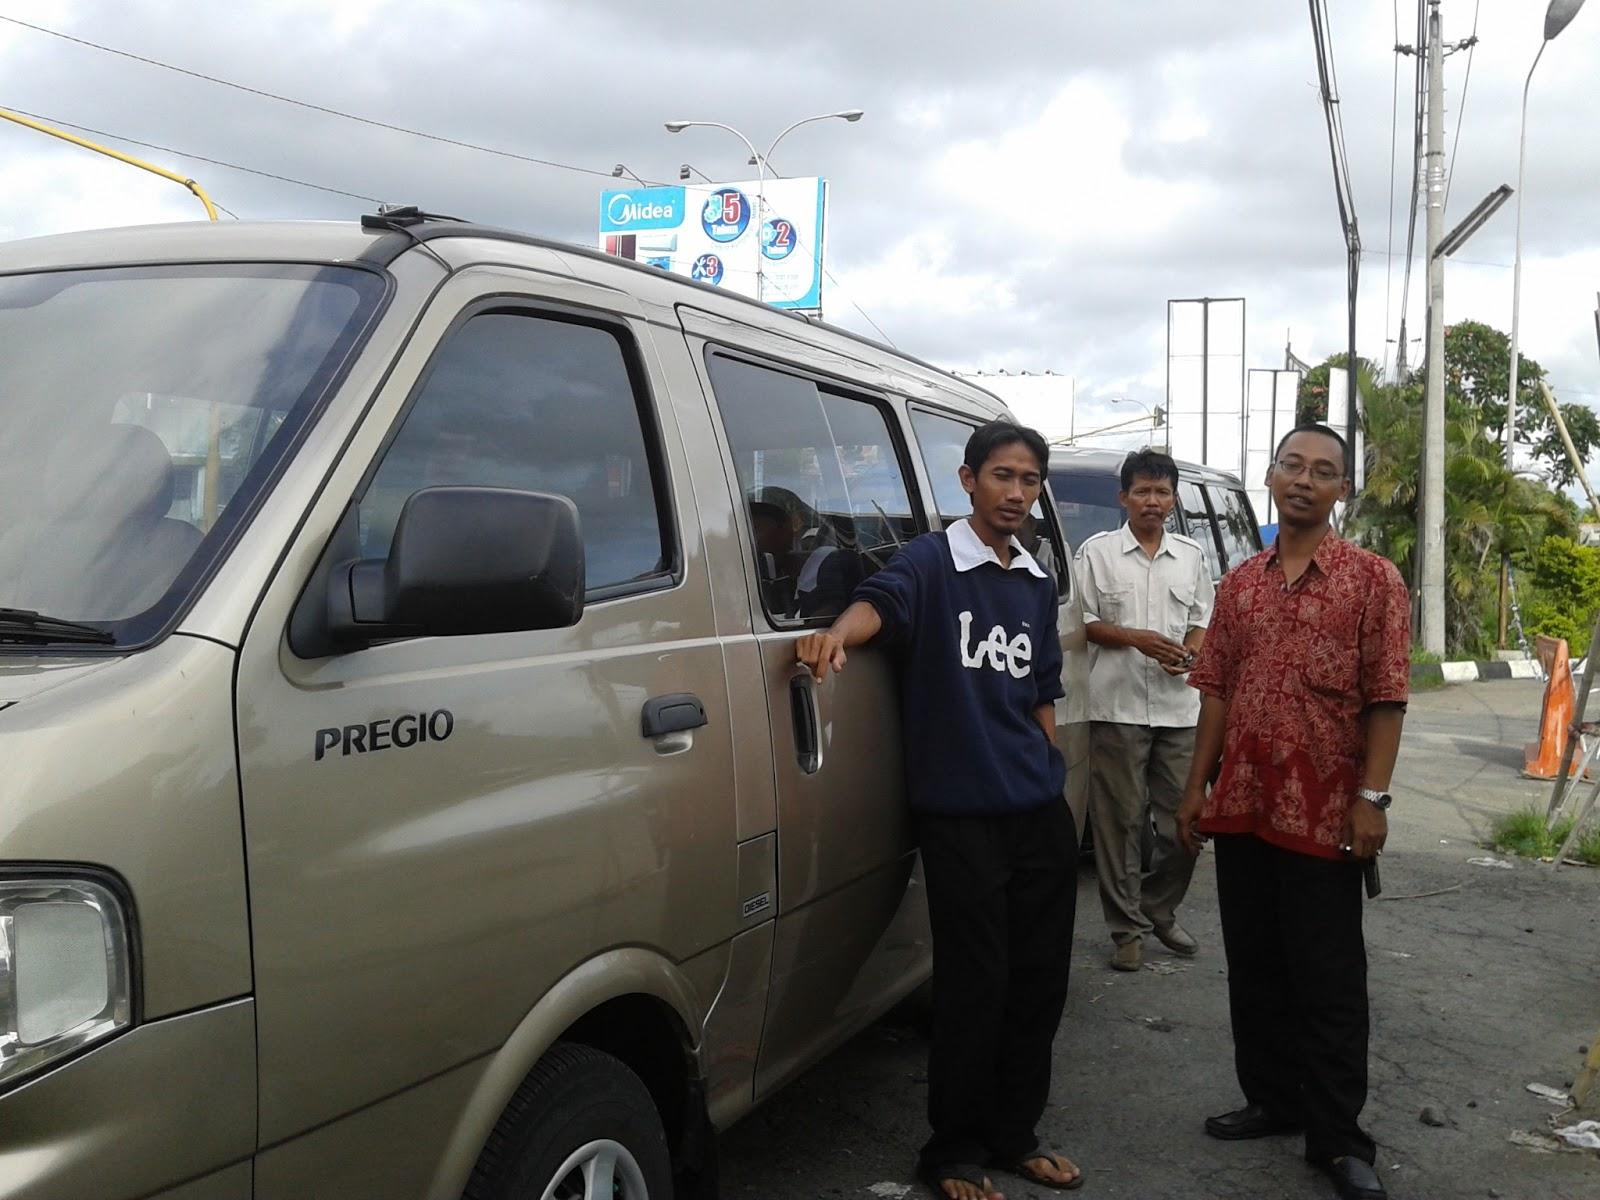 Sewa Mobil Grand New Avanza Jogja Brand Toyota Camry For Sale Lebaran 2013 Di